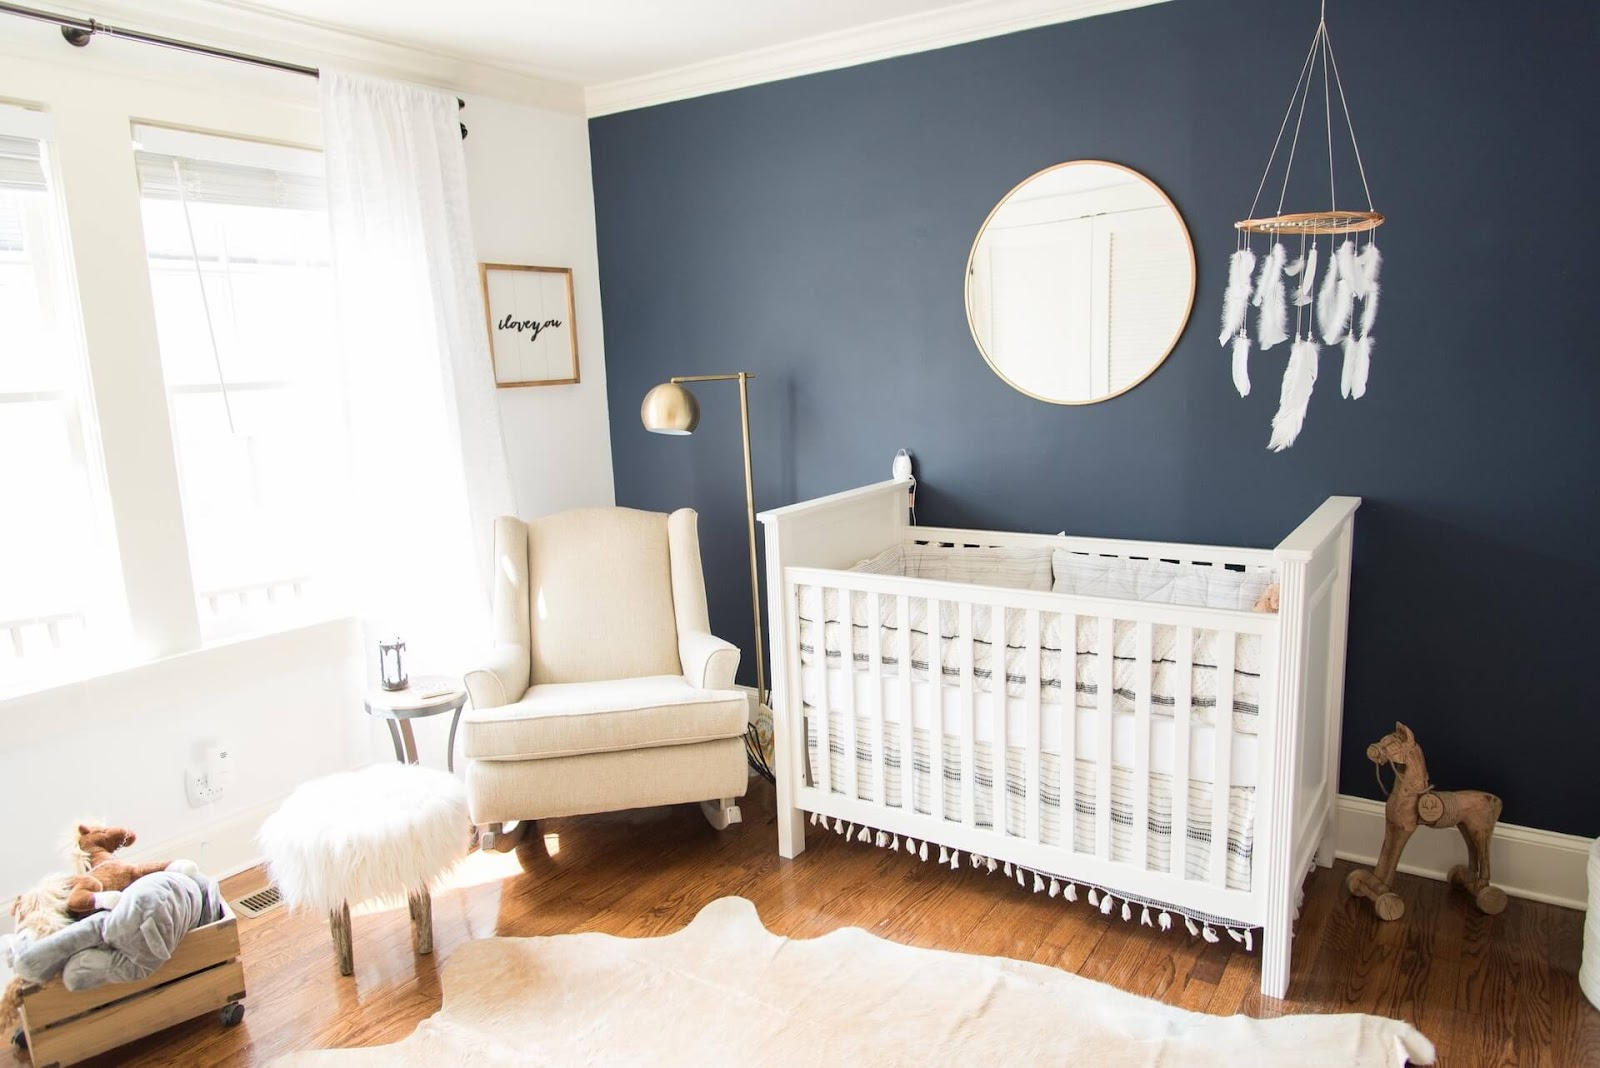 Room painted blue